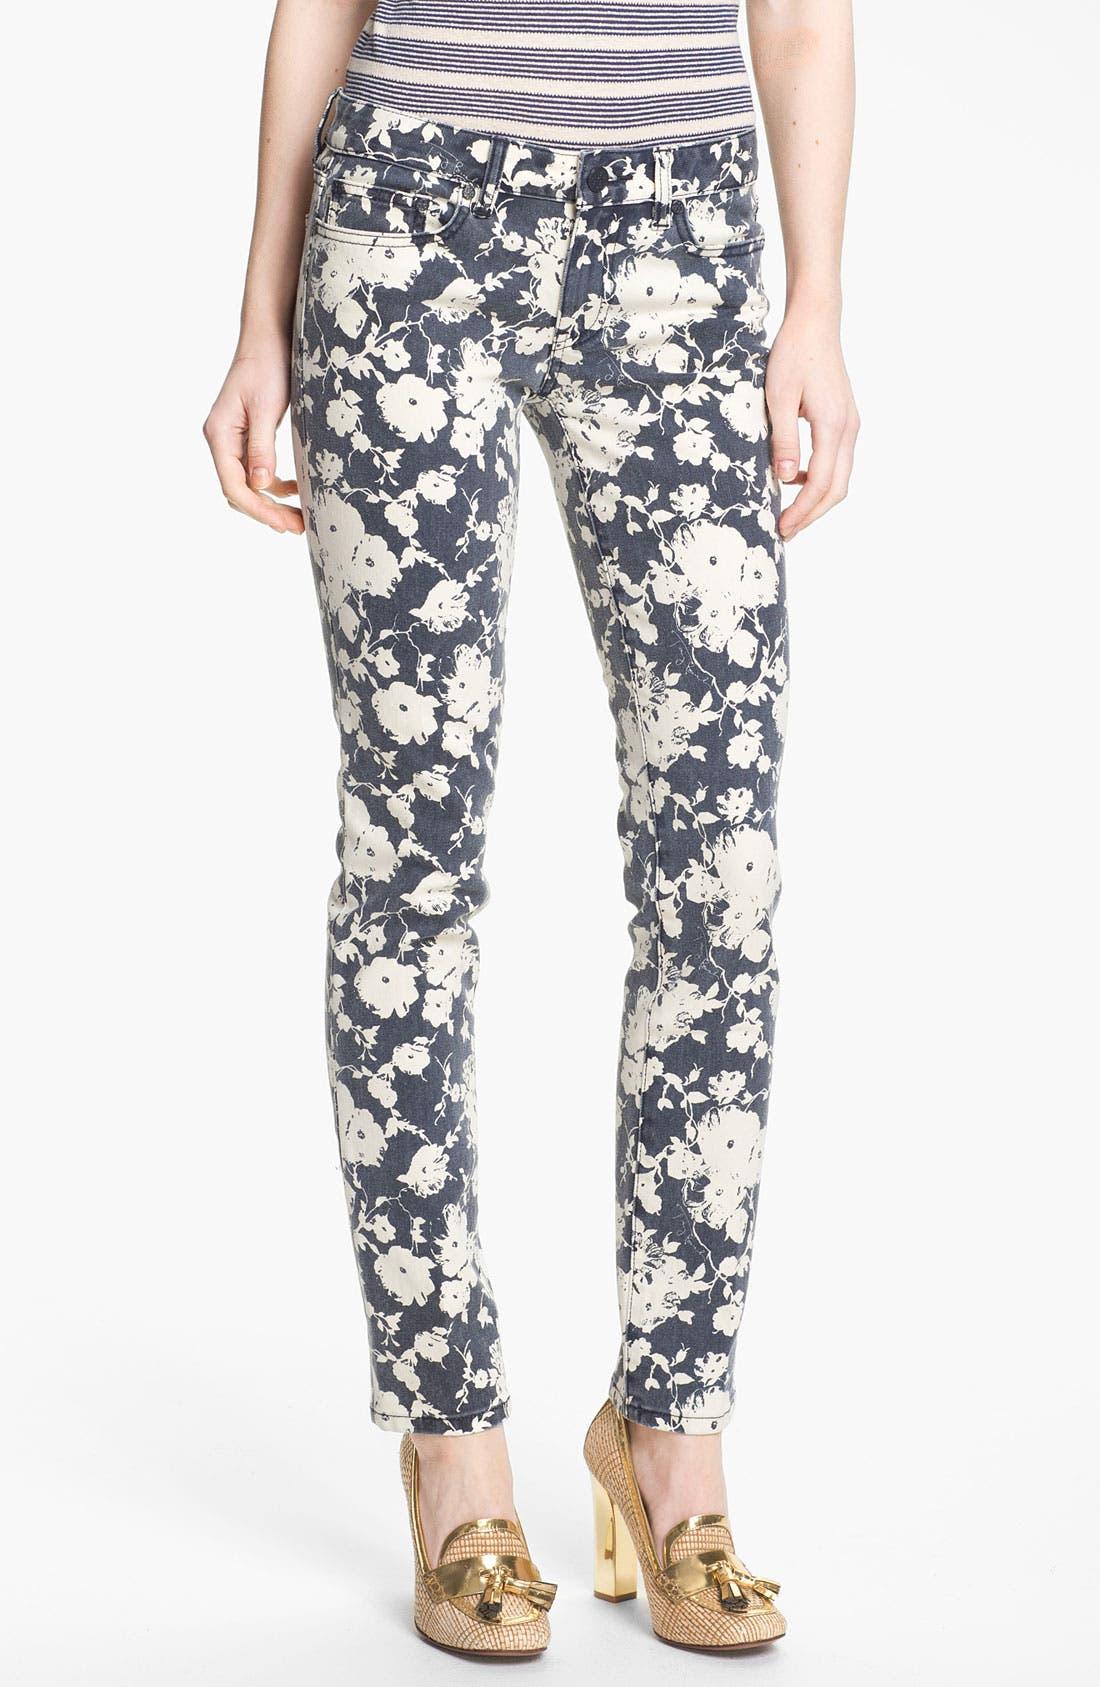 Main Image - Tory Burch 'Alexa' Print Skinny Jeans (Tory Navy Abbott)